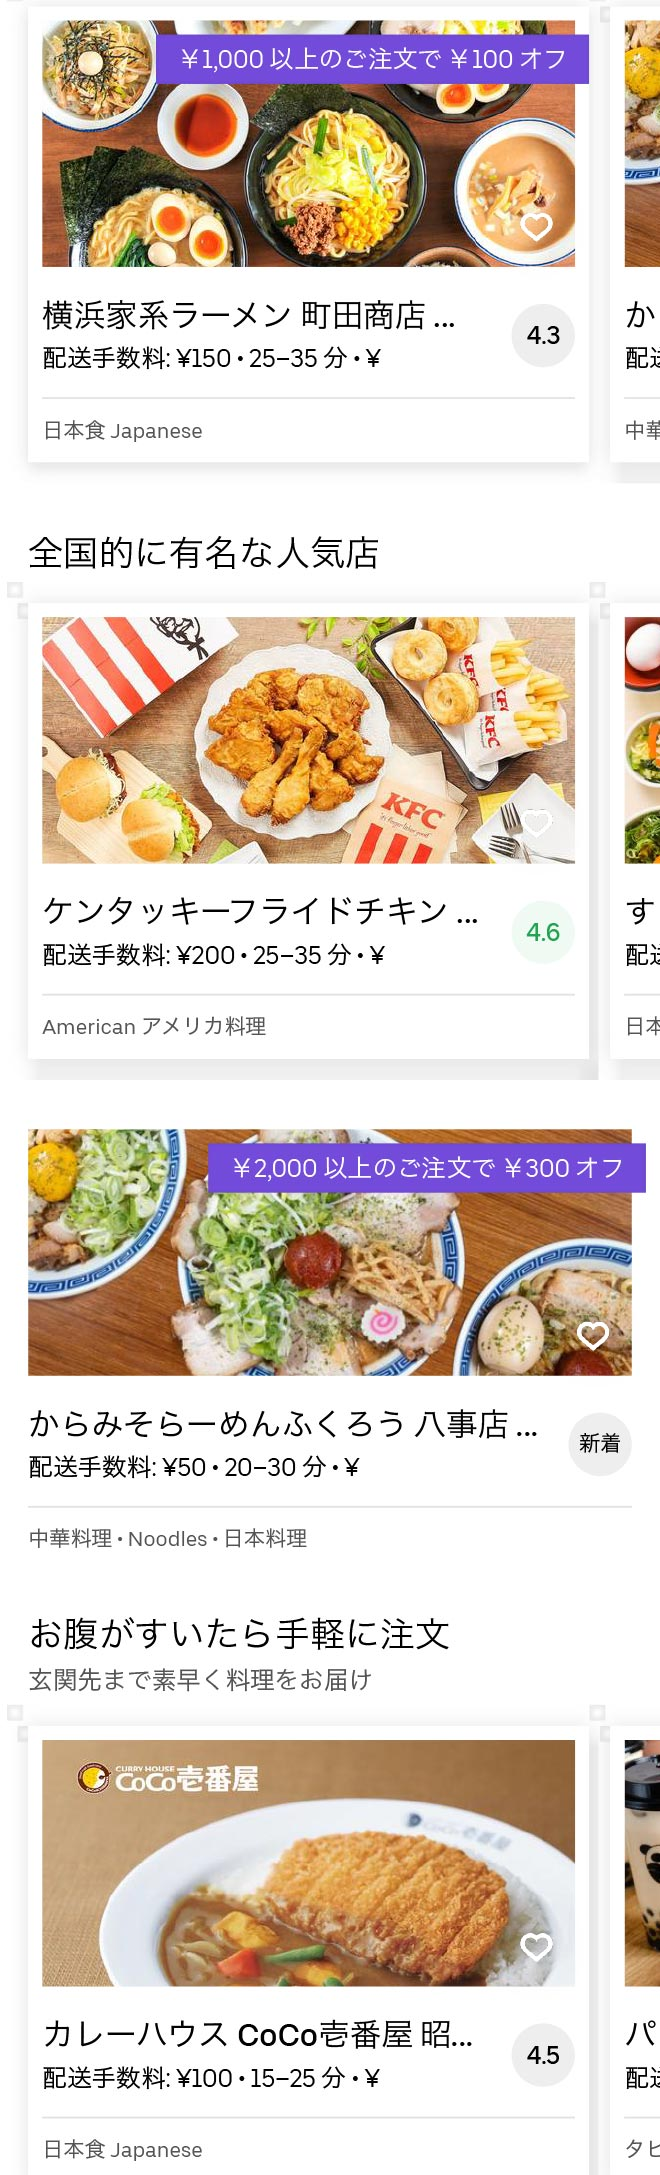 Nagoya yagoto menu 2005 01